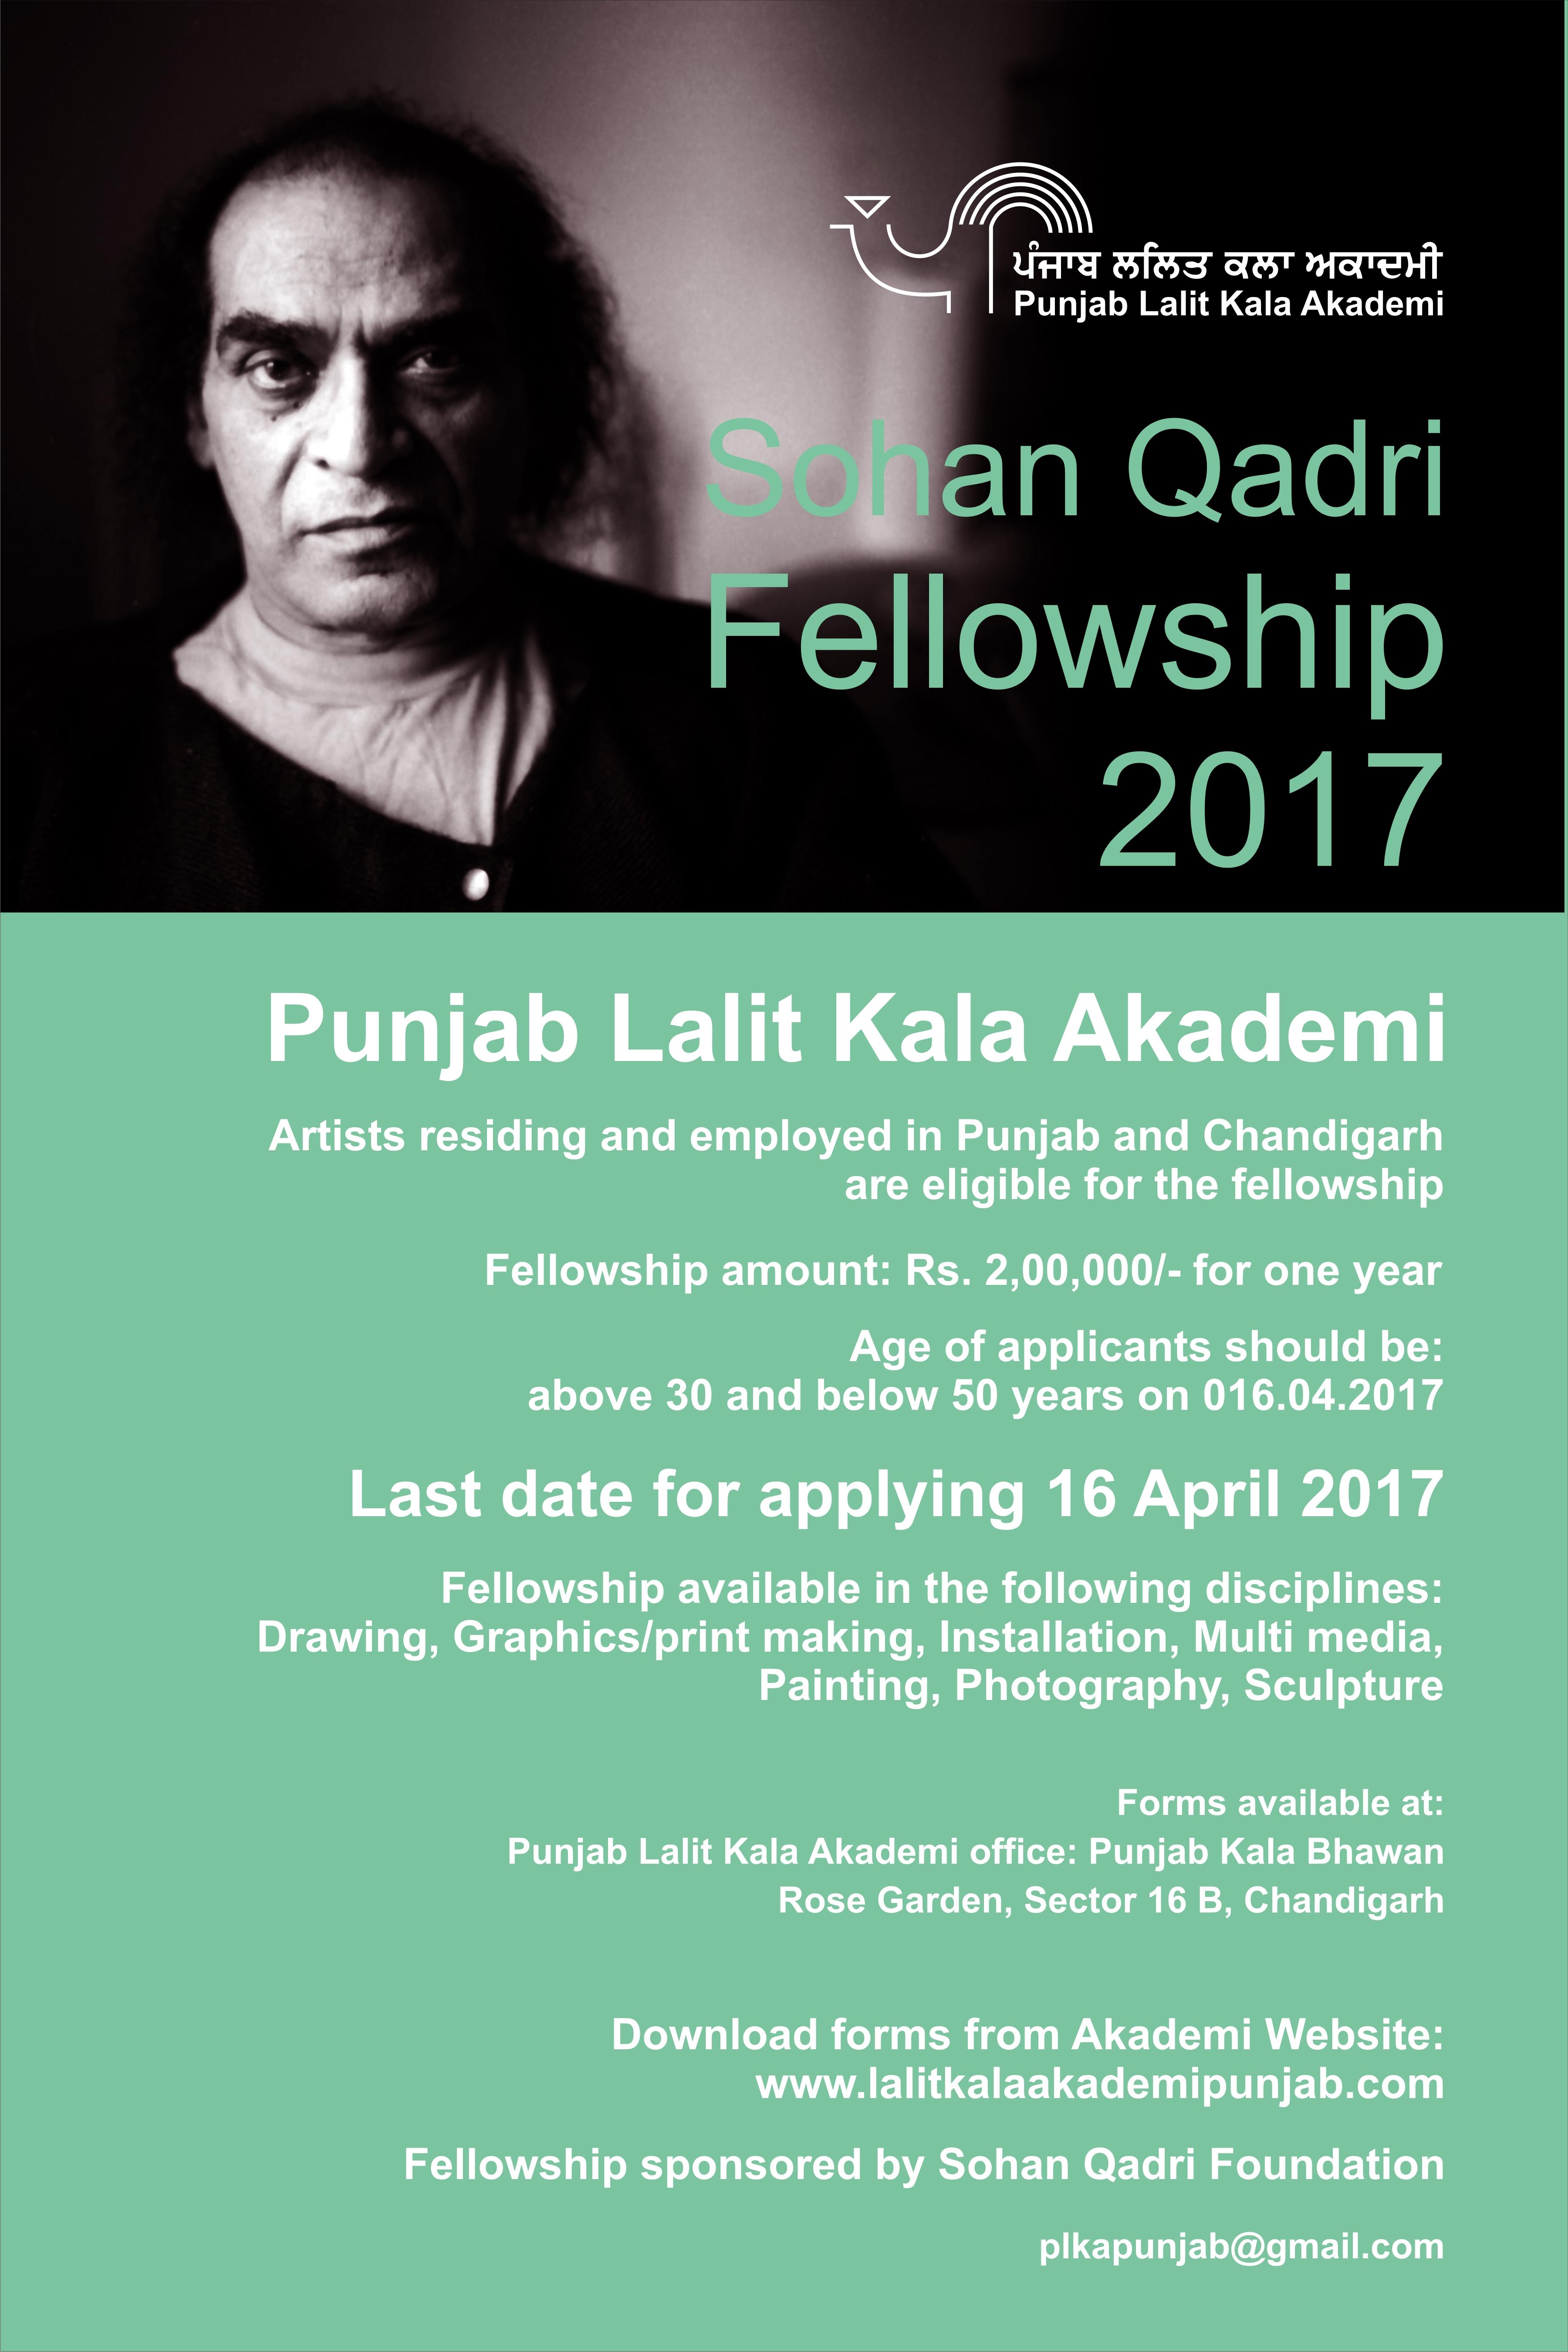 Sohan Qadri Fellowship 2017